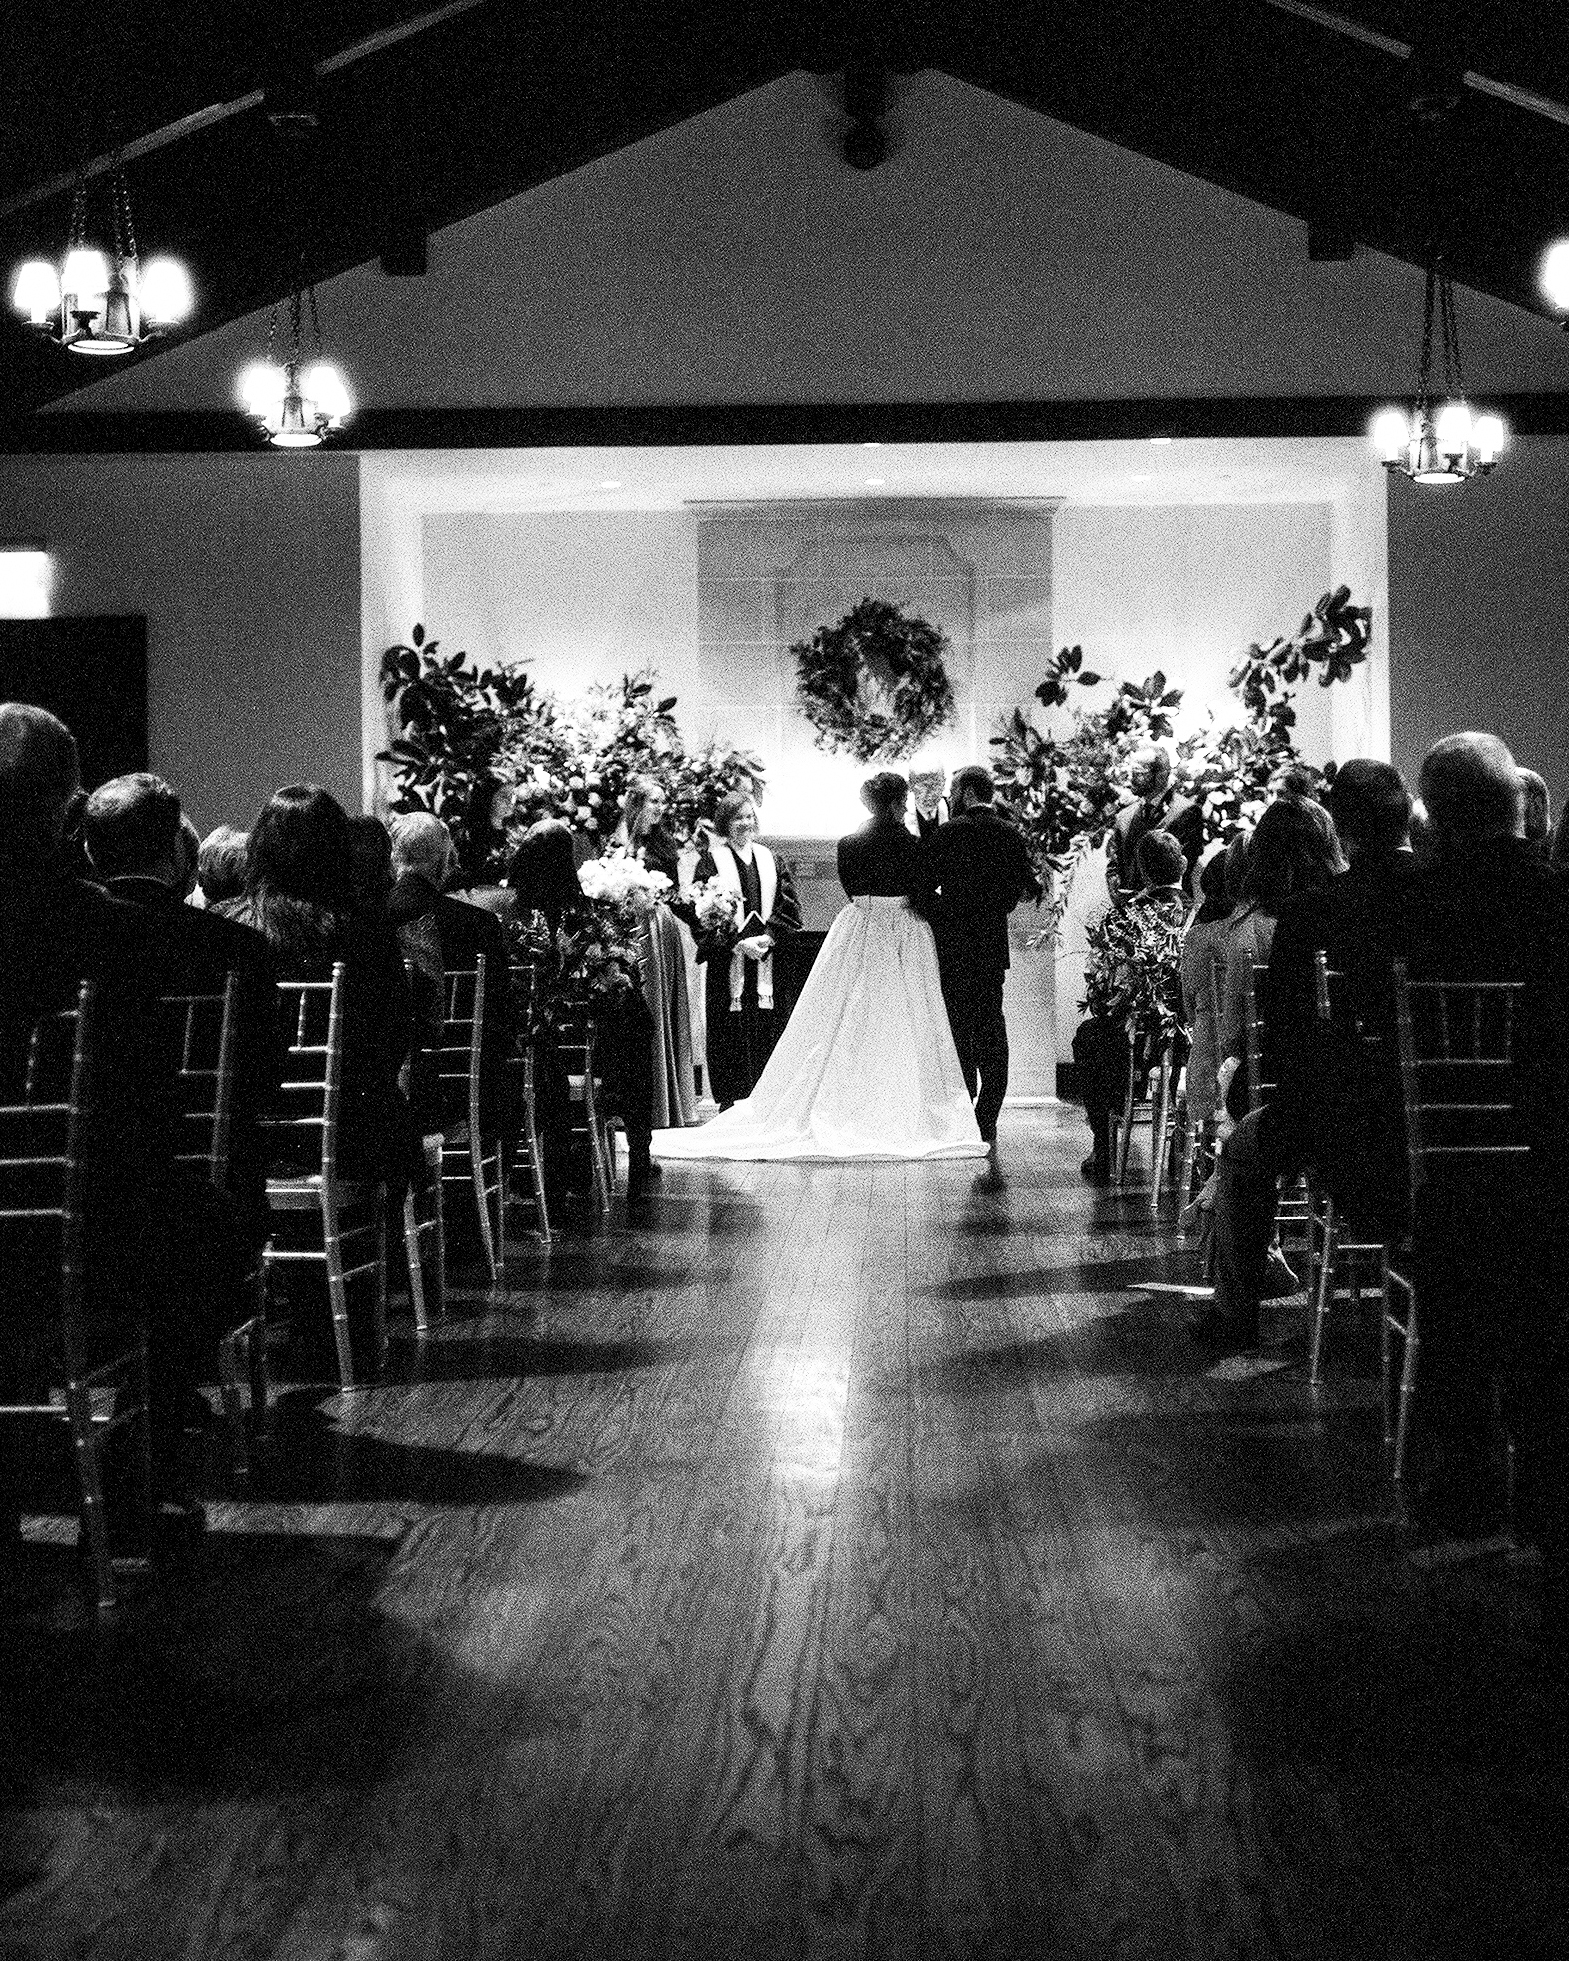 jane-ryan-wedding-ceremony-203-s111352-0714.jpg